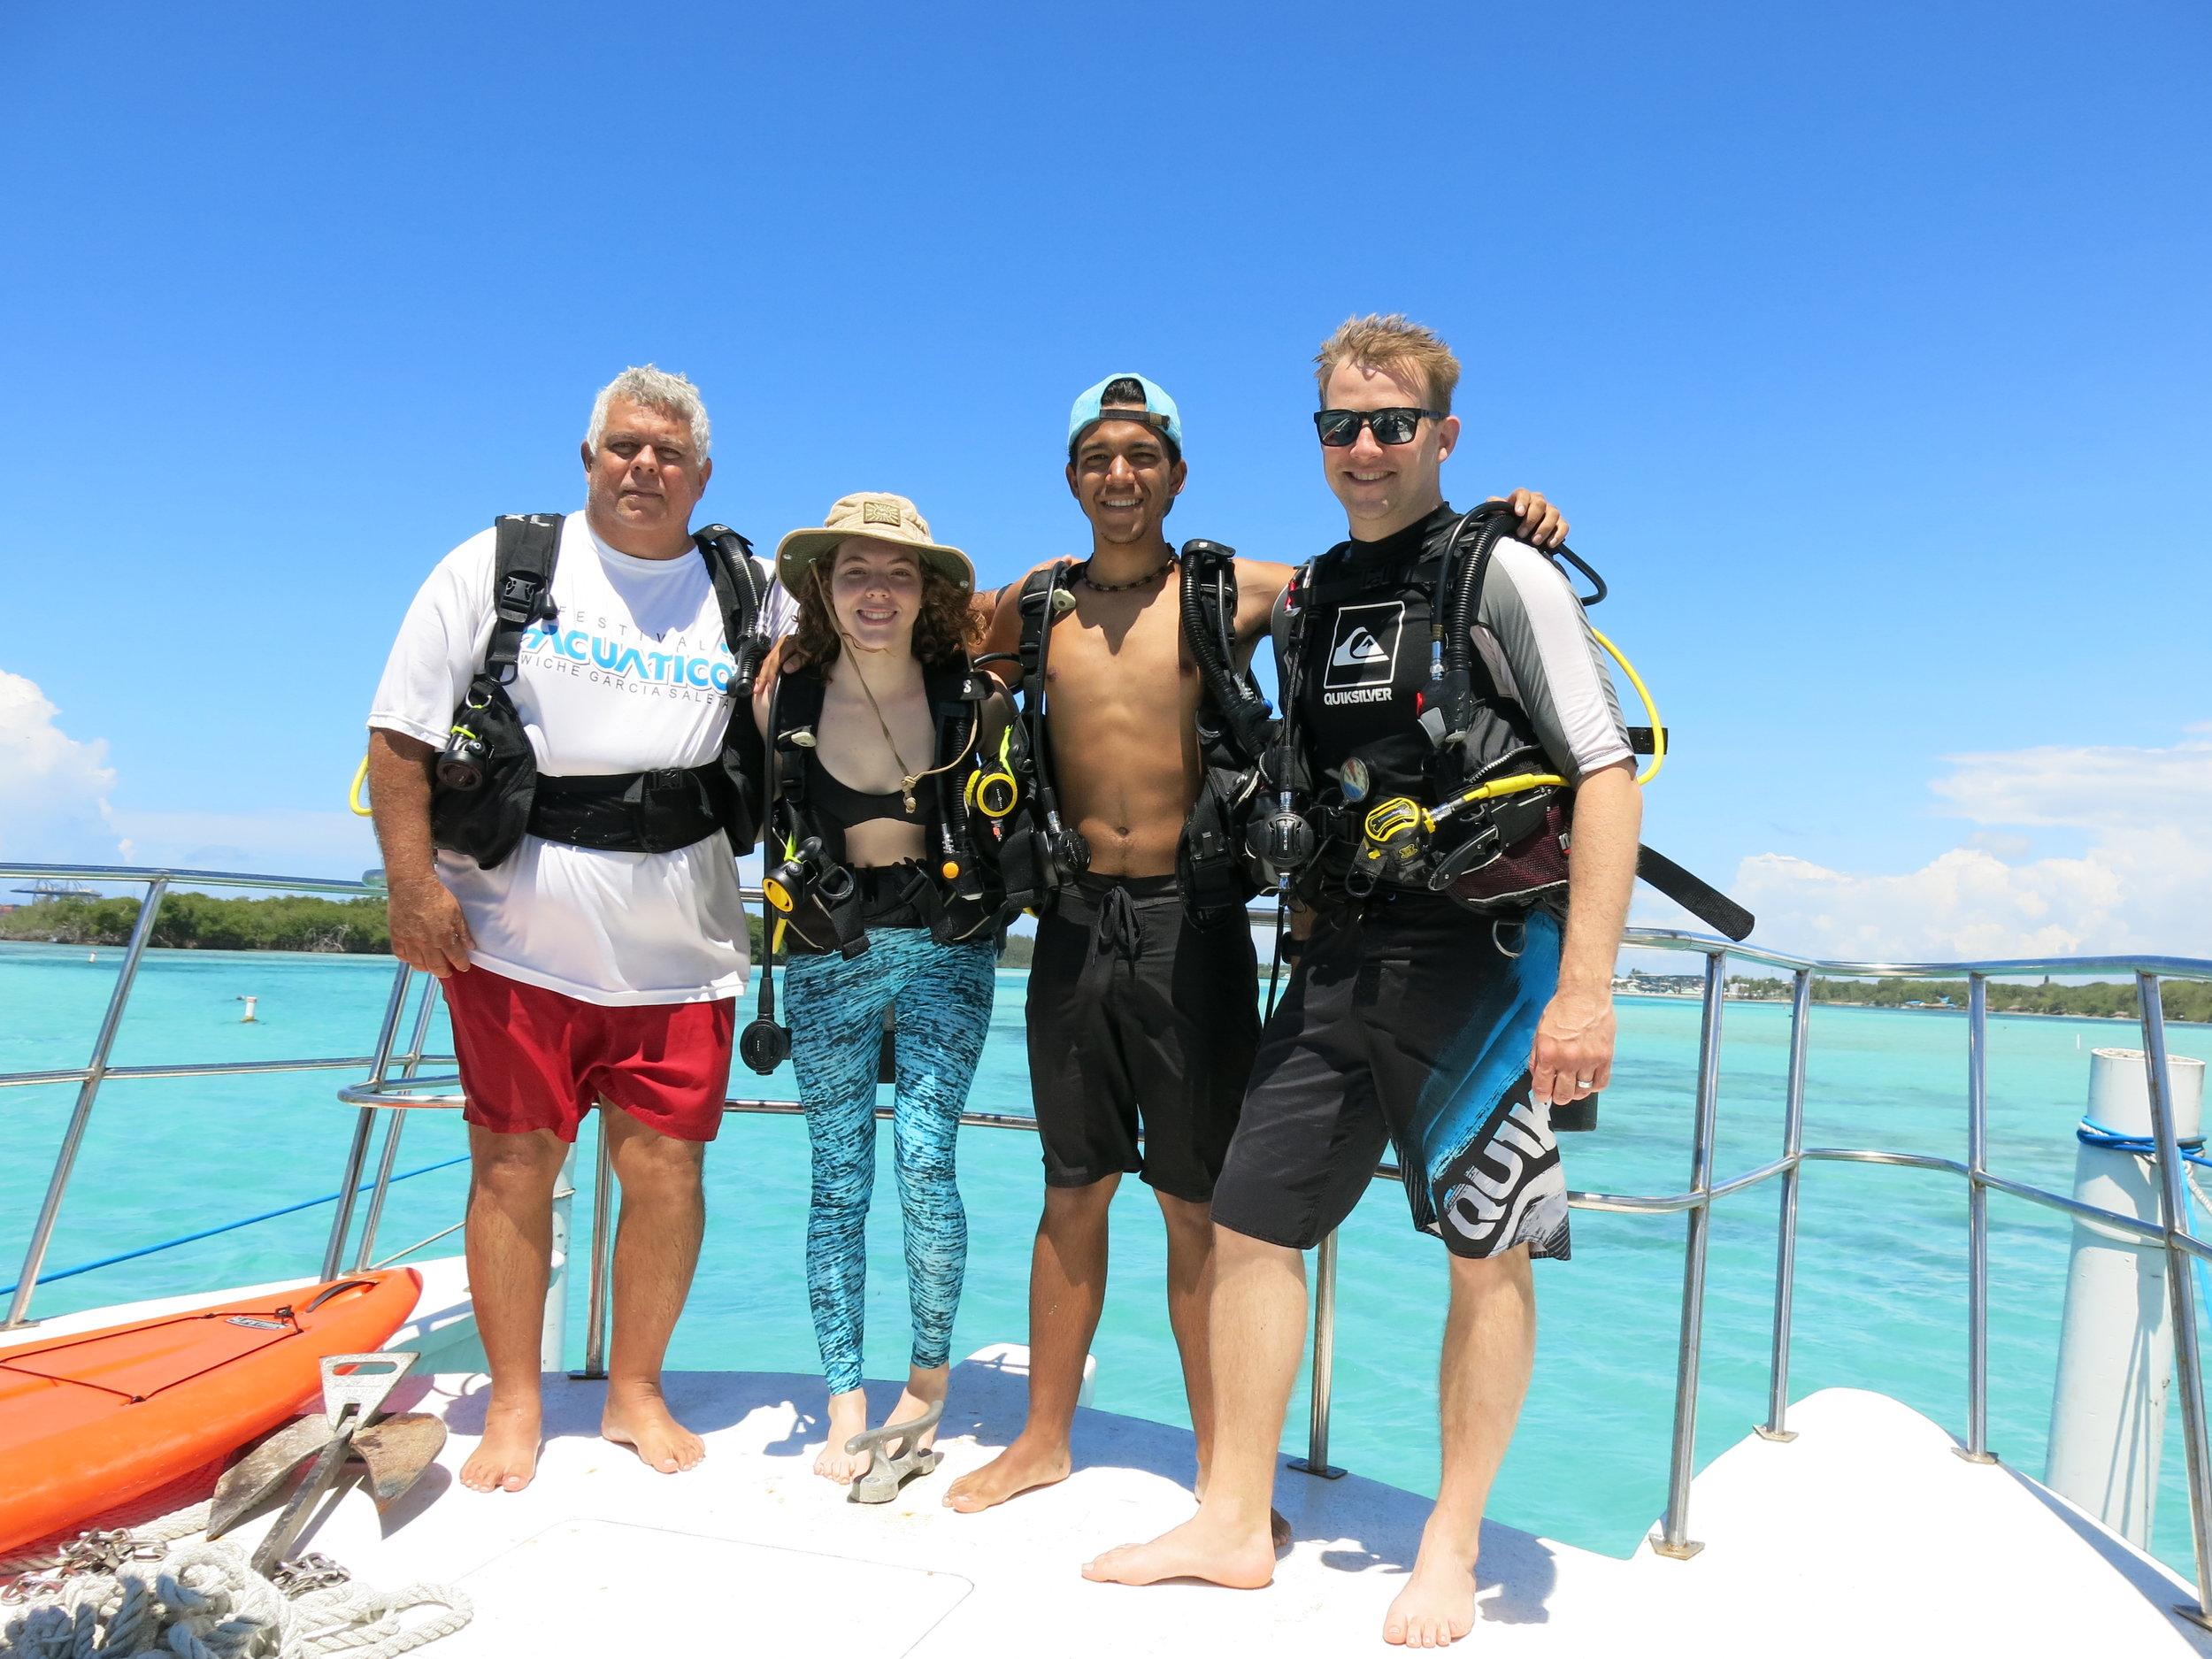 The new Green Fins Assessors - Chilo, Ana Carolina, Iker and Reef-World's JJ